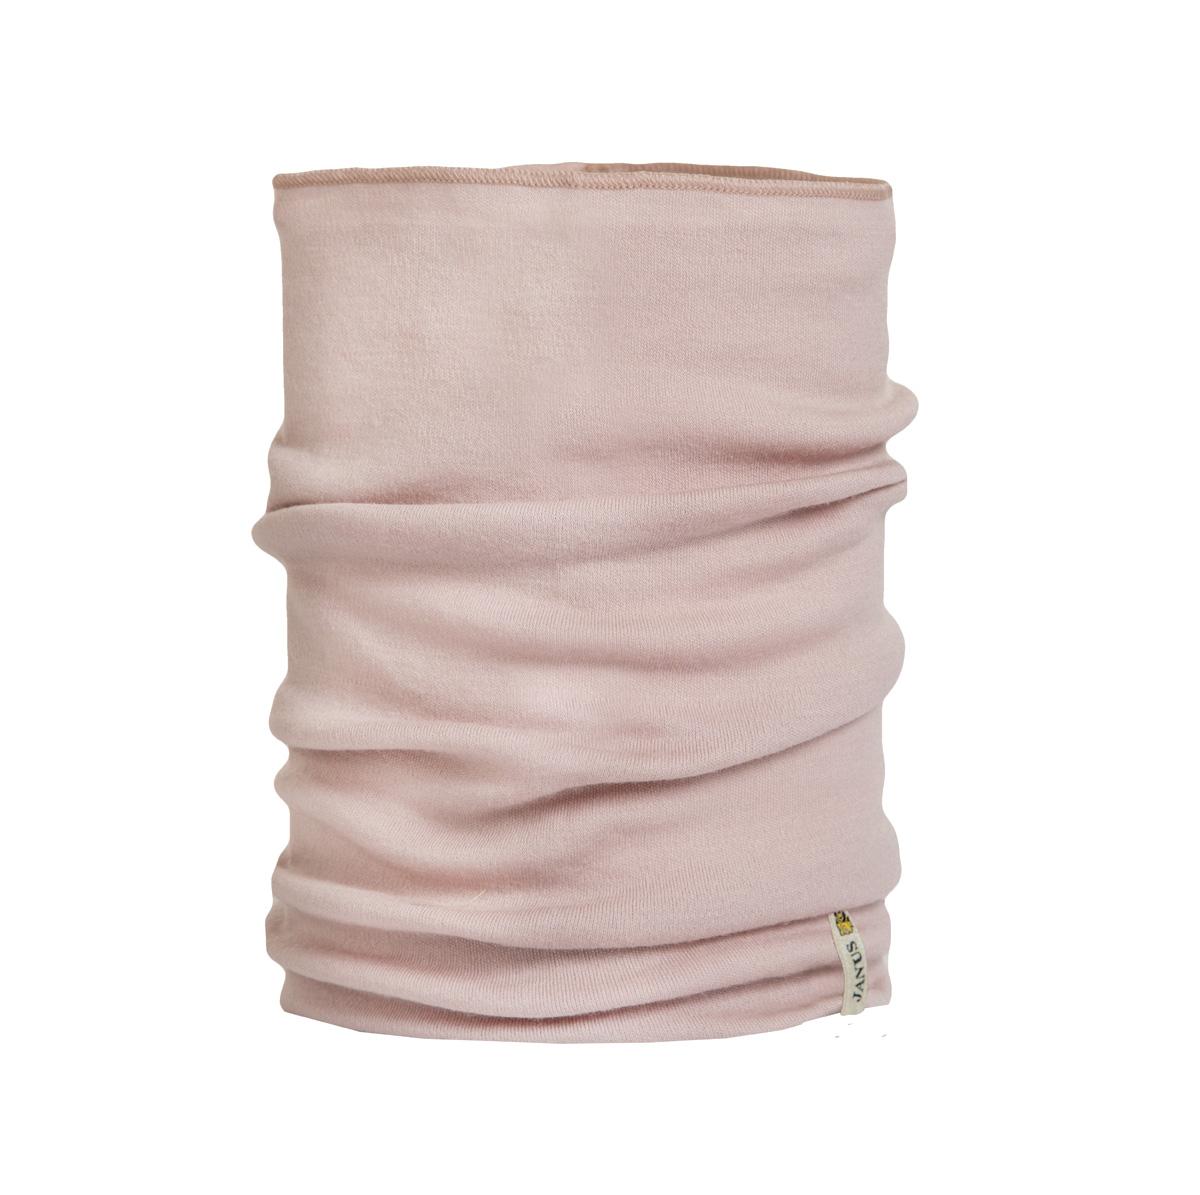 Janus halsduk neckwarmer barn 100% merinoull gammalrosa